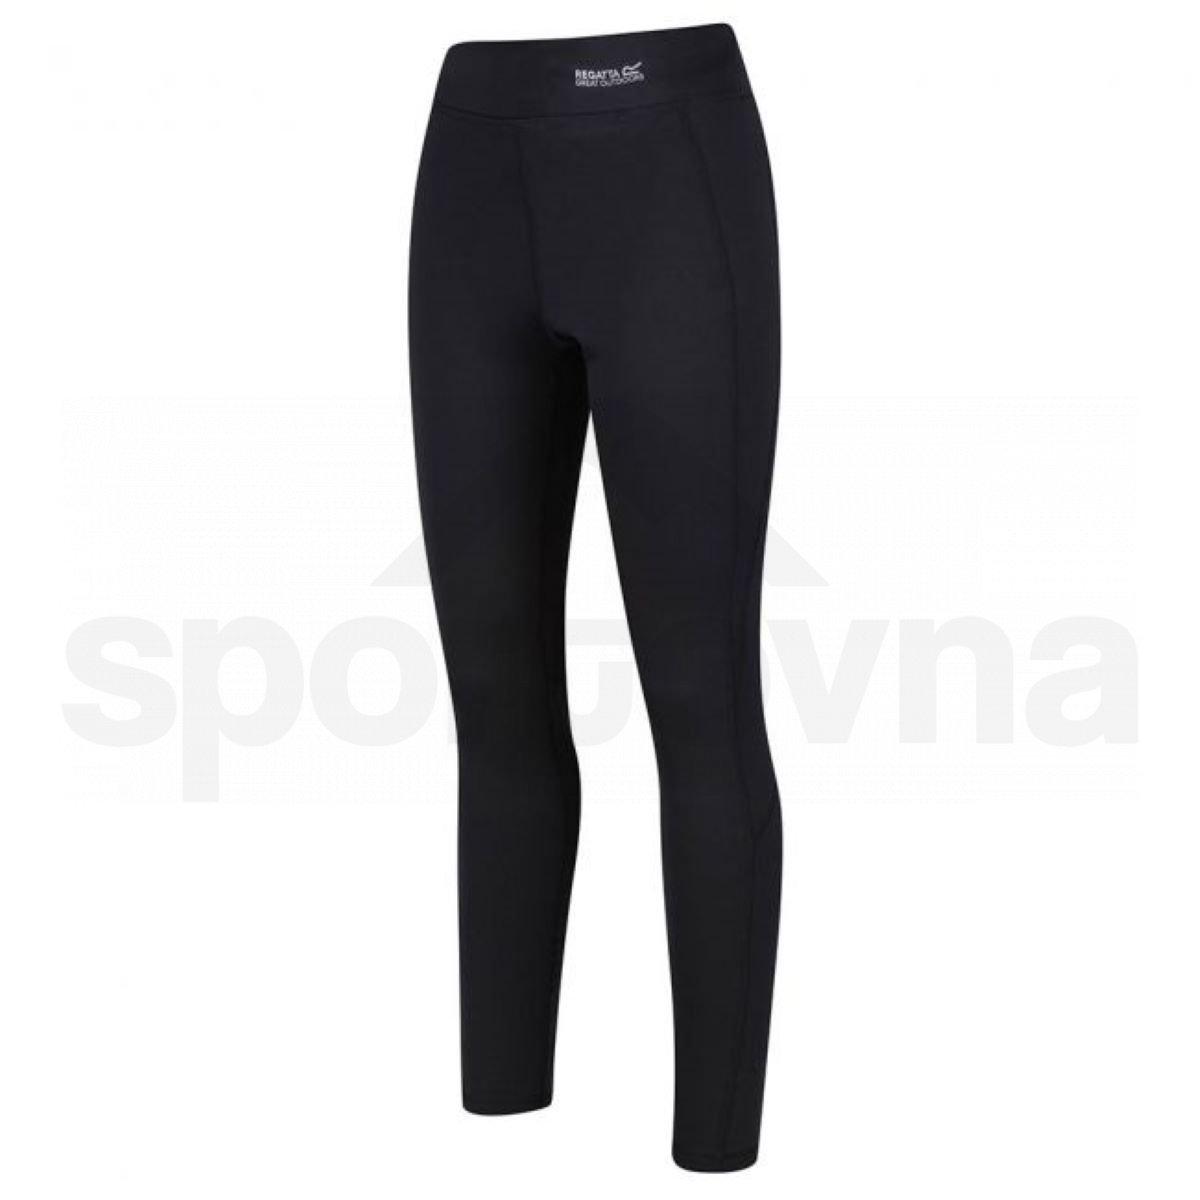 rwj252-800-black-regatta-womens-holeen-winter-leggins 3